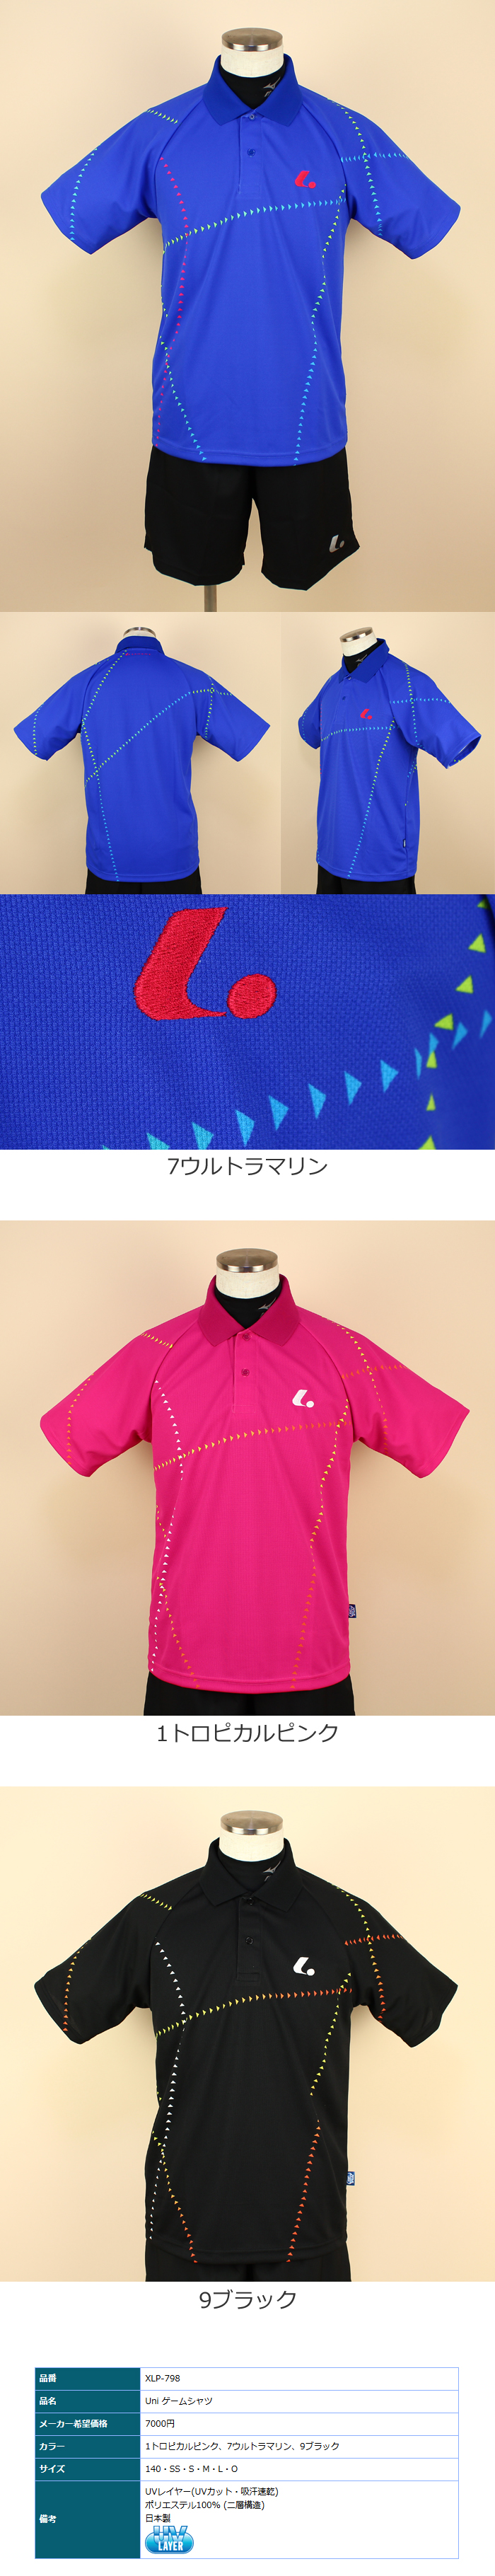 http://youspo.on.arena.ne.jp/newproduct/LUCENT/XLP-798/xlp798.jpg